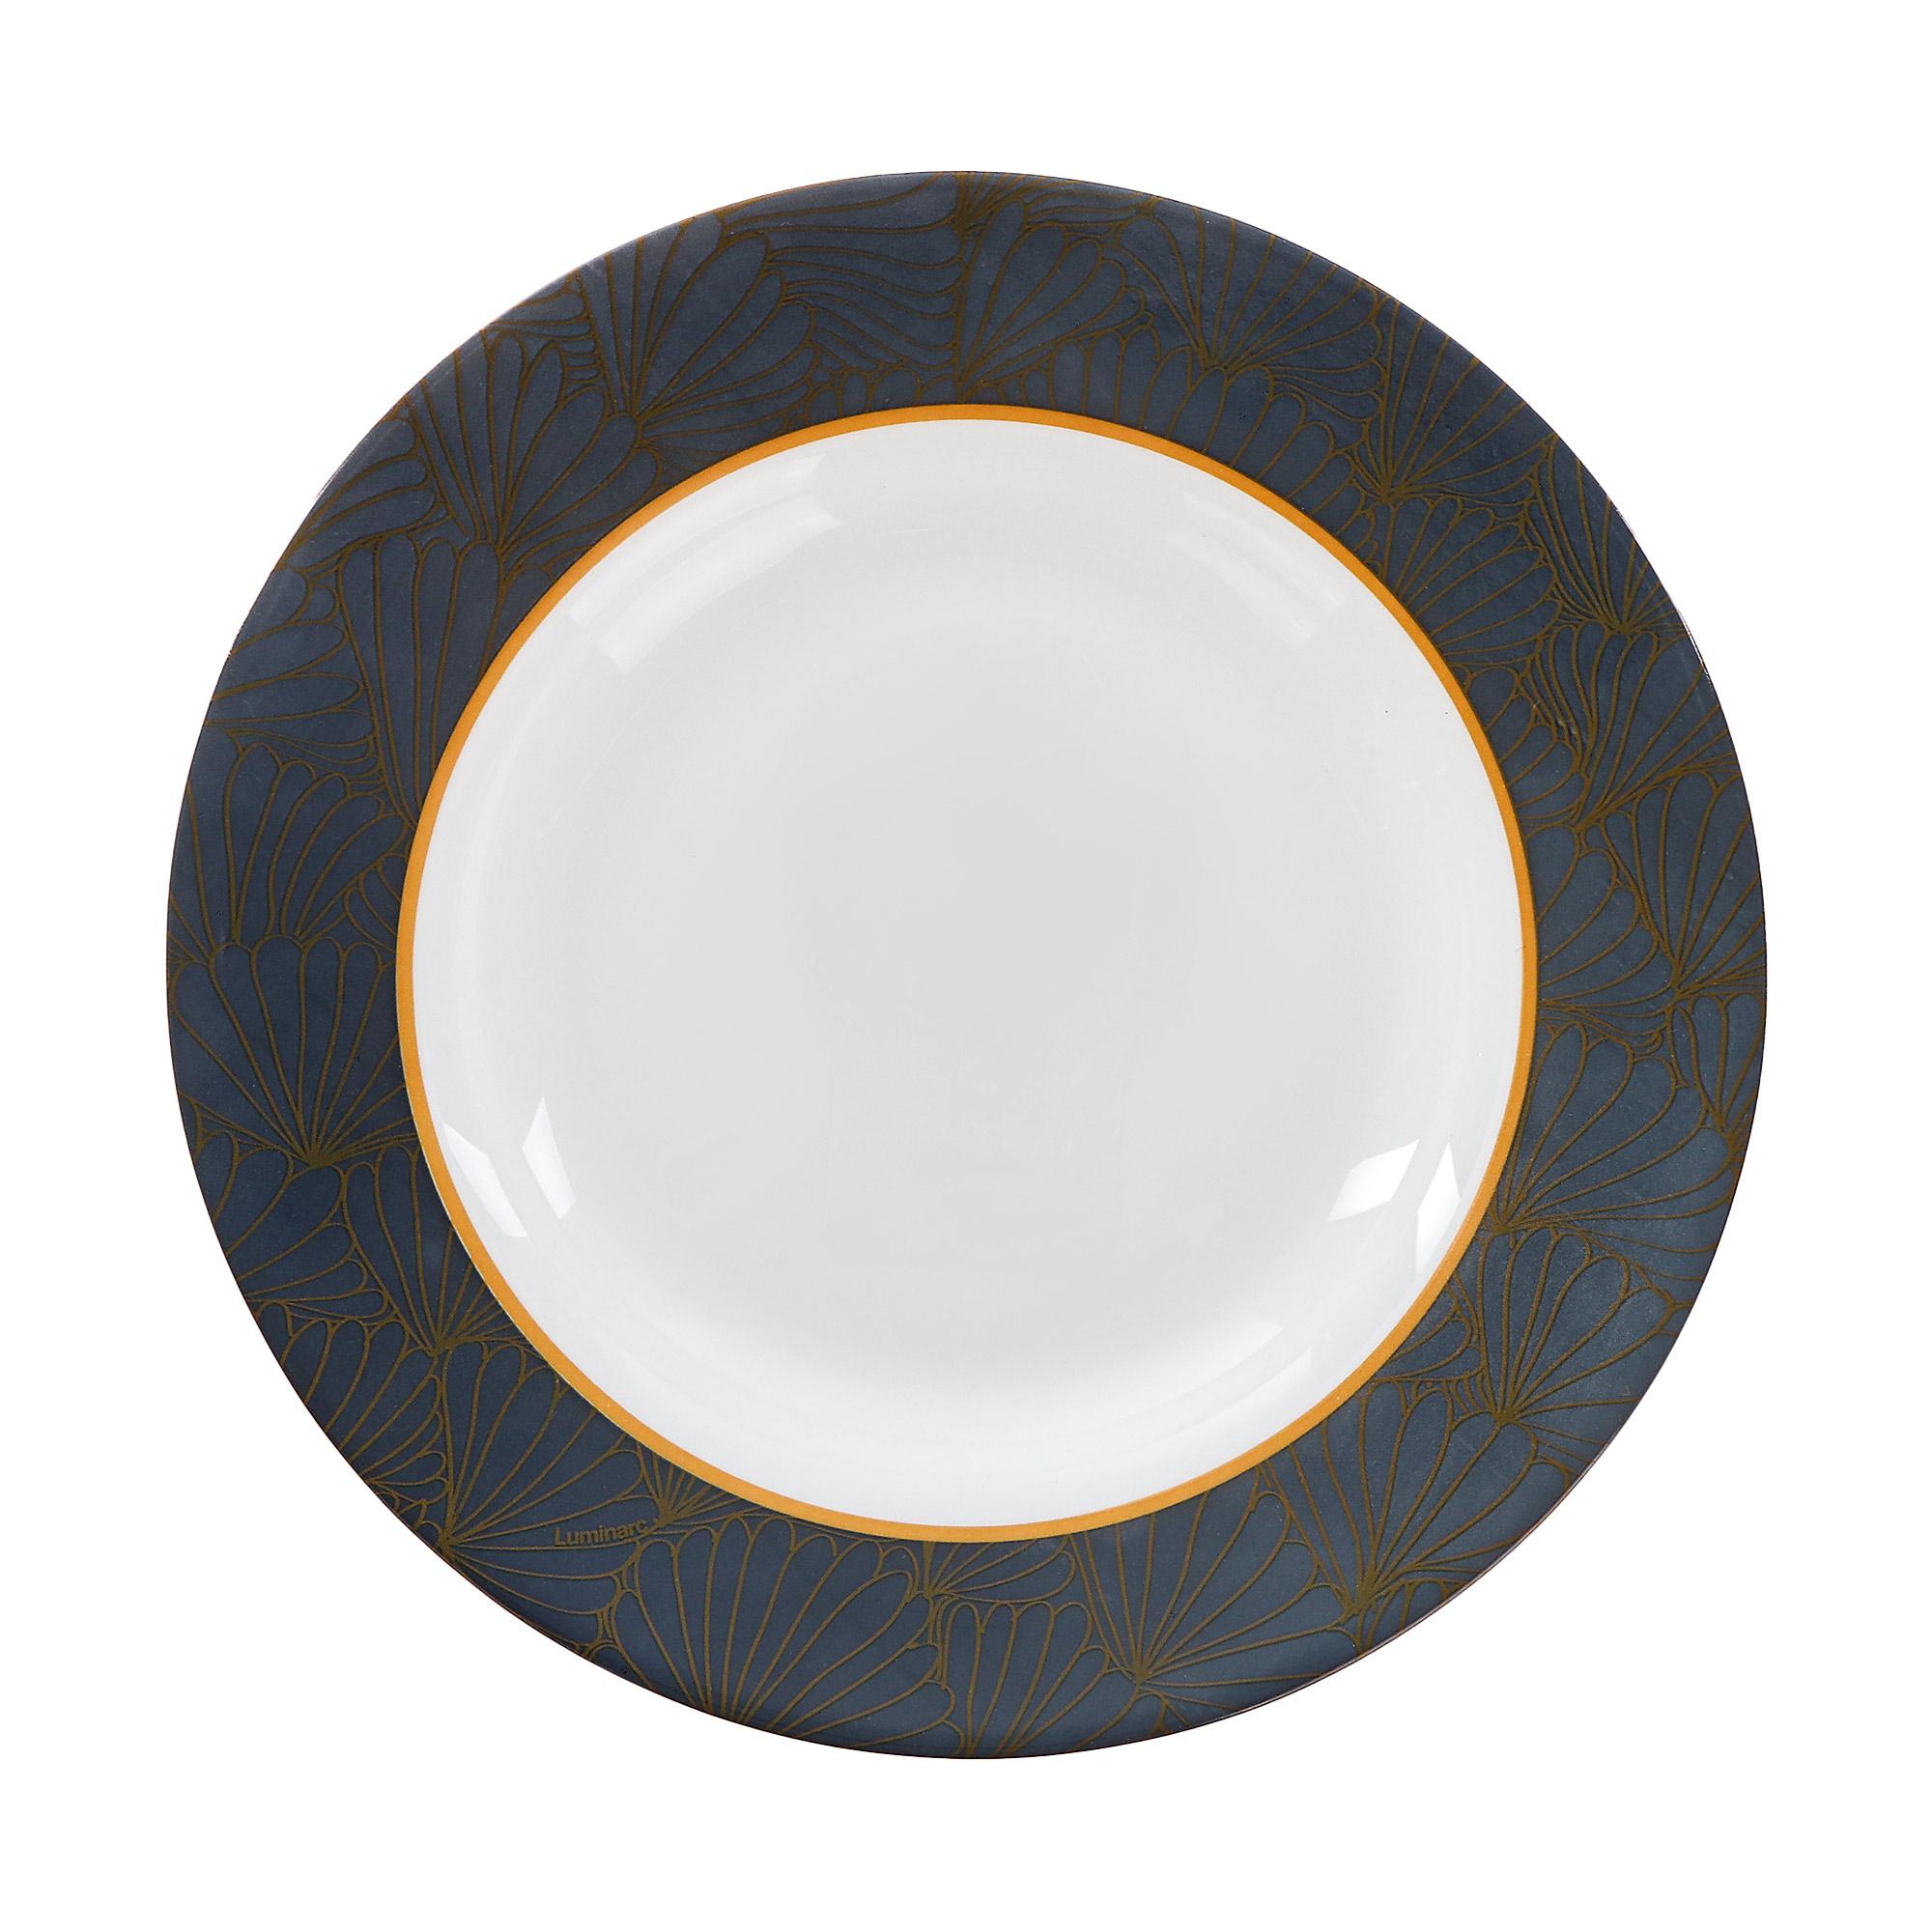 Тарелка суповая Luminarc Prusse 22 см тарелка суповая luminarc amely 22 см